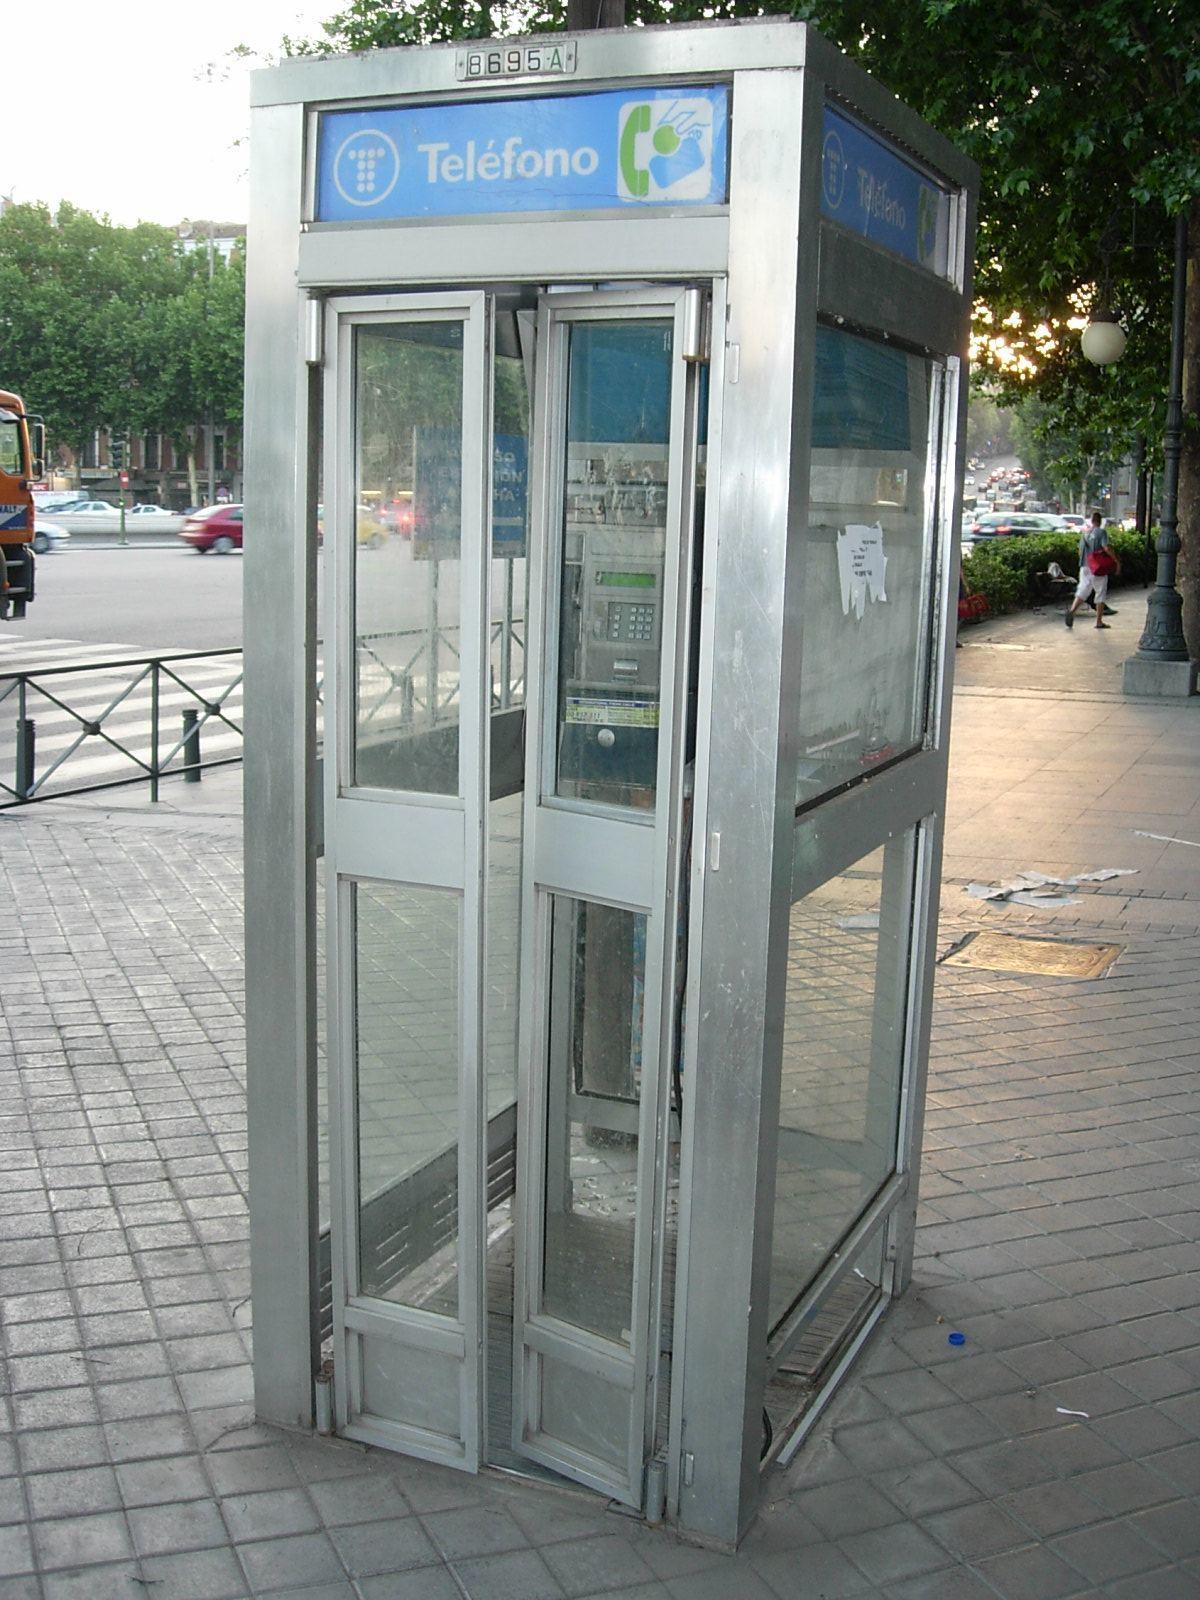 Good bye cabinas de teléfono... ¿por qué desaparecen?